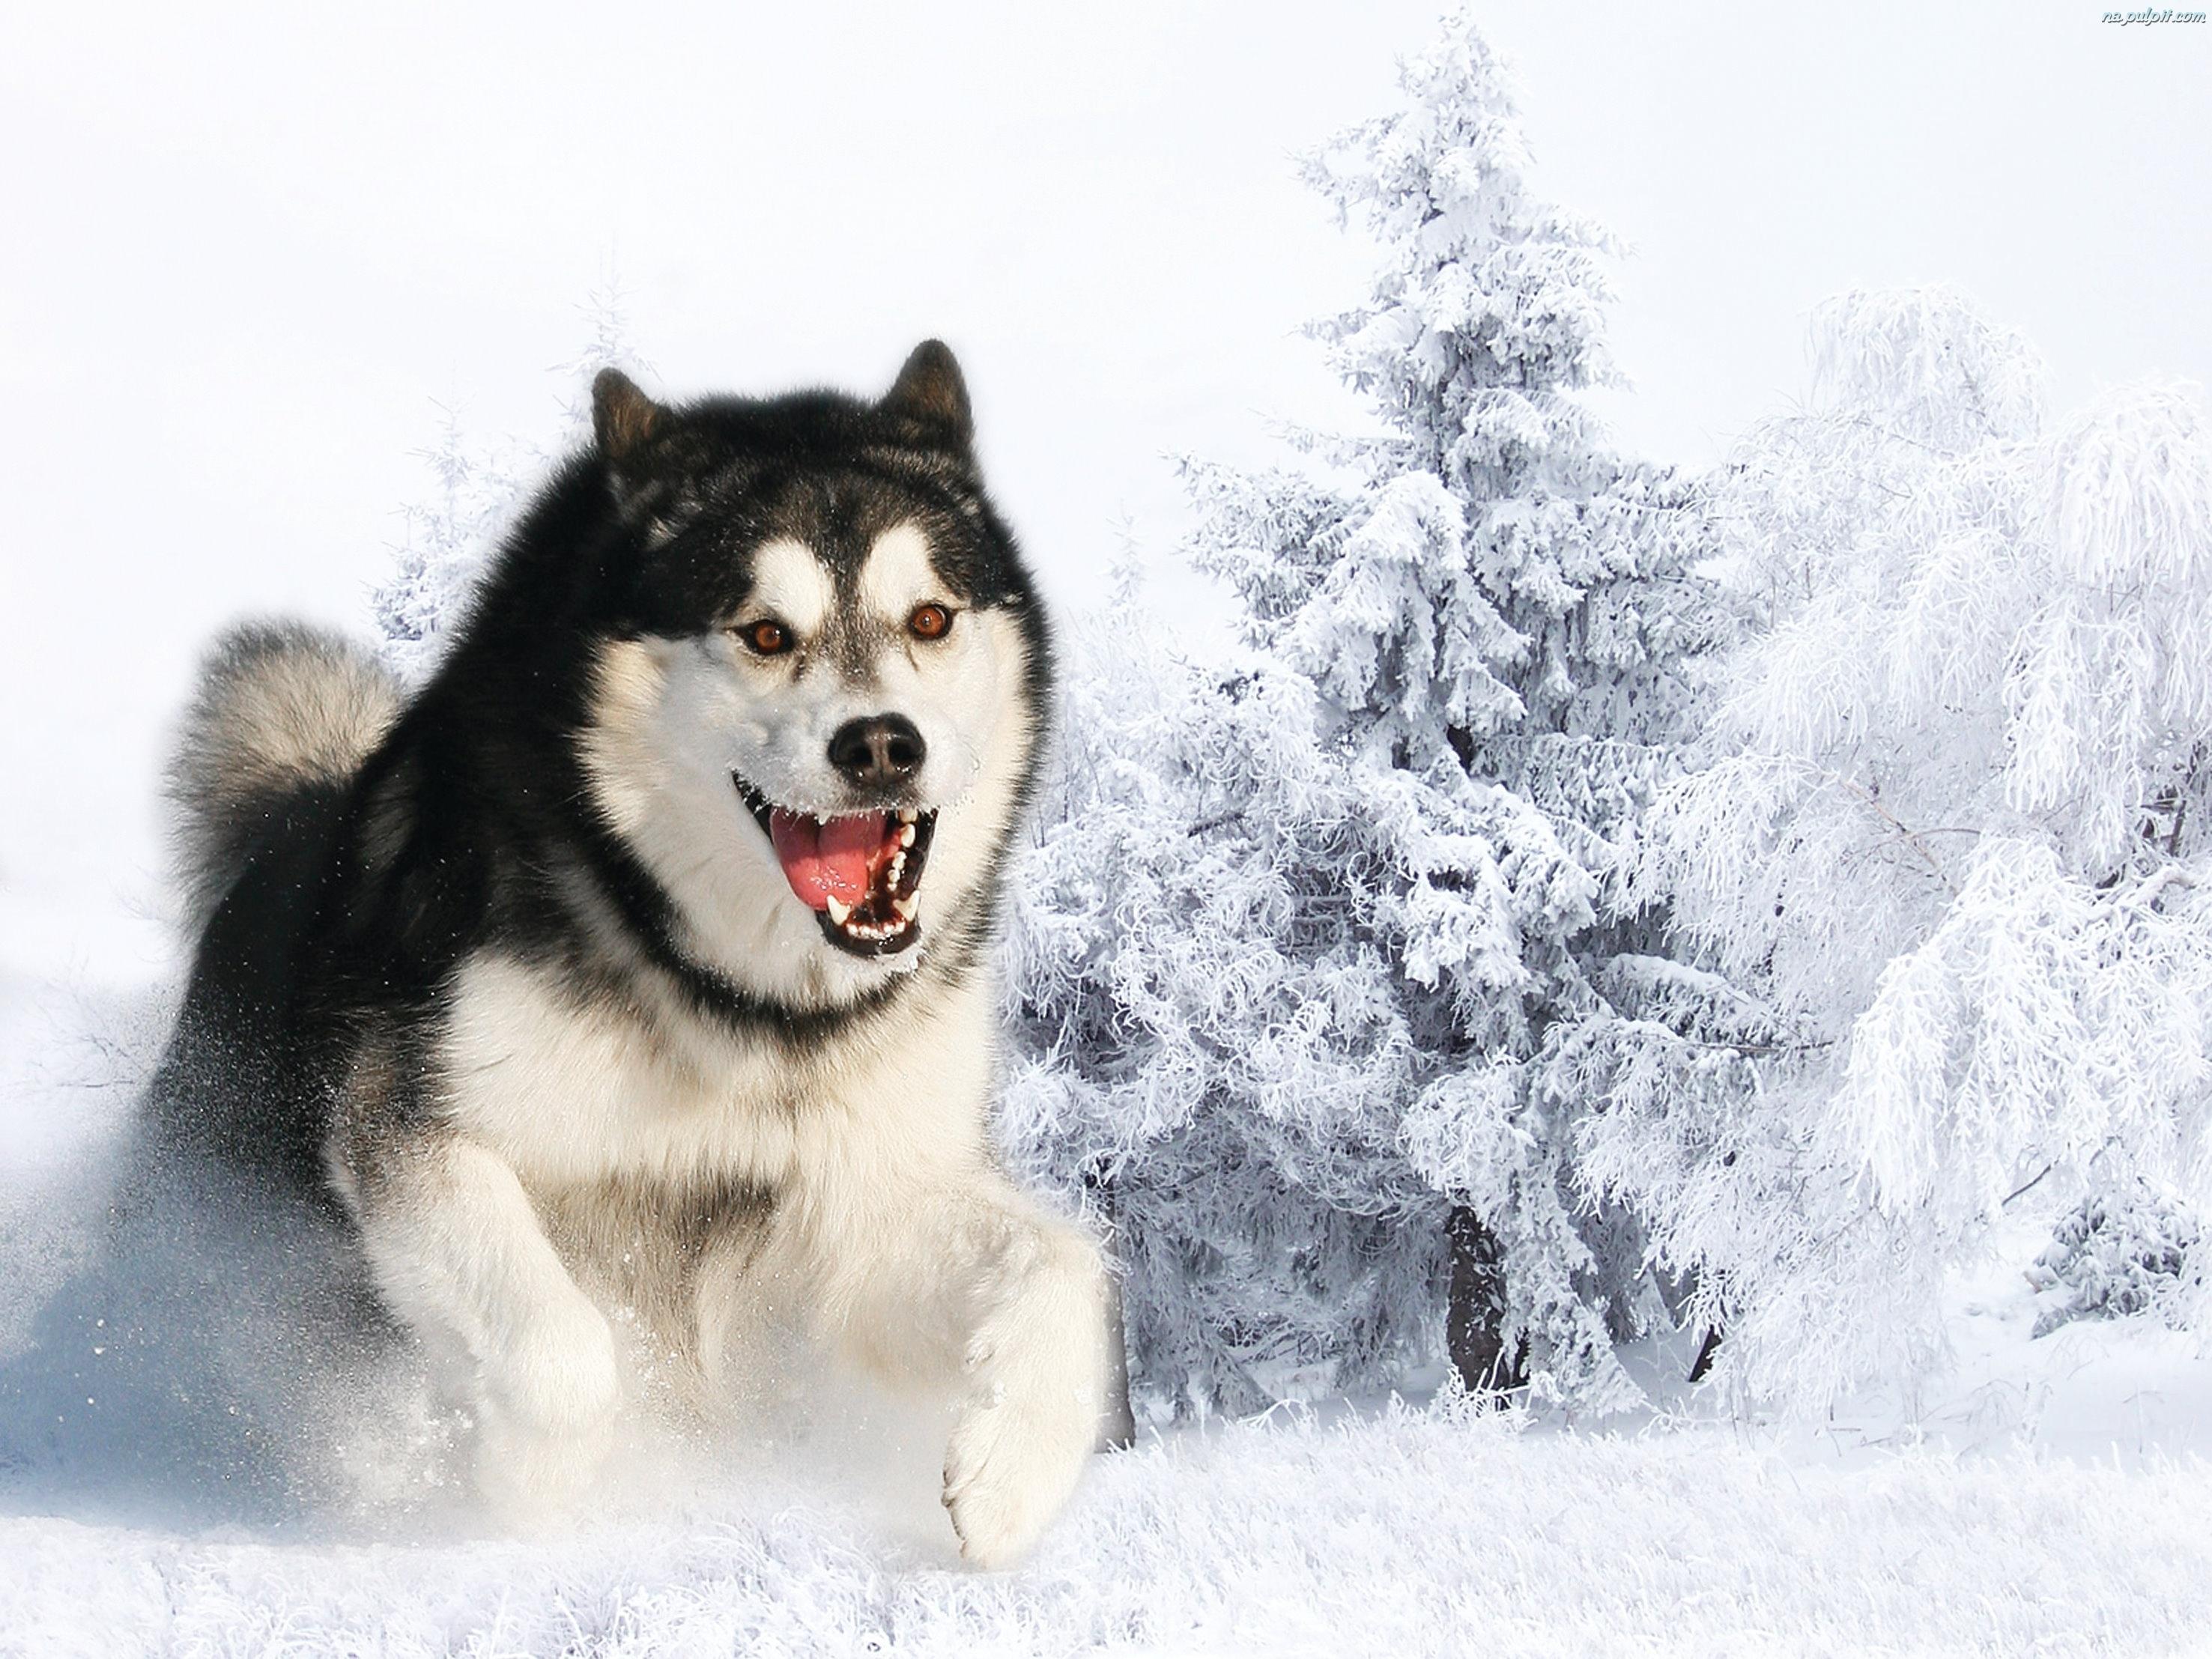 Śnieg, Husky, Siberian, Zima Na Pulpit